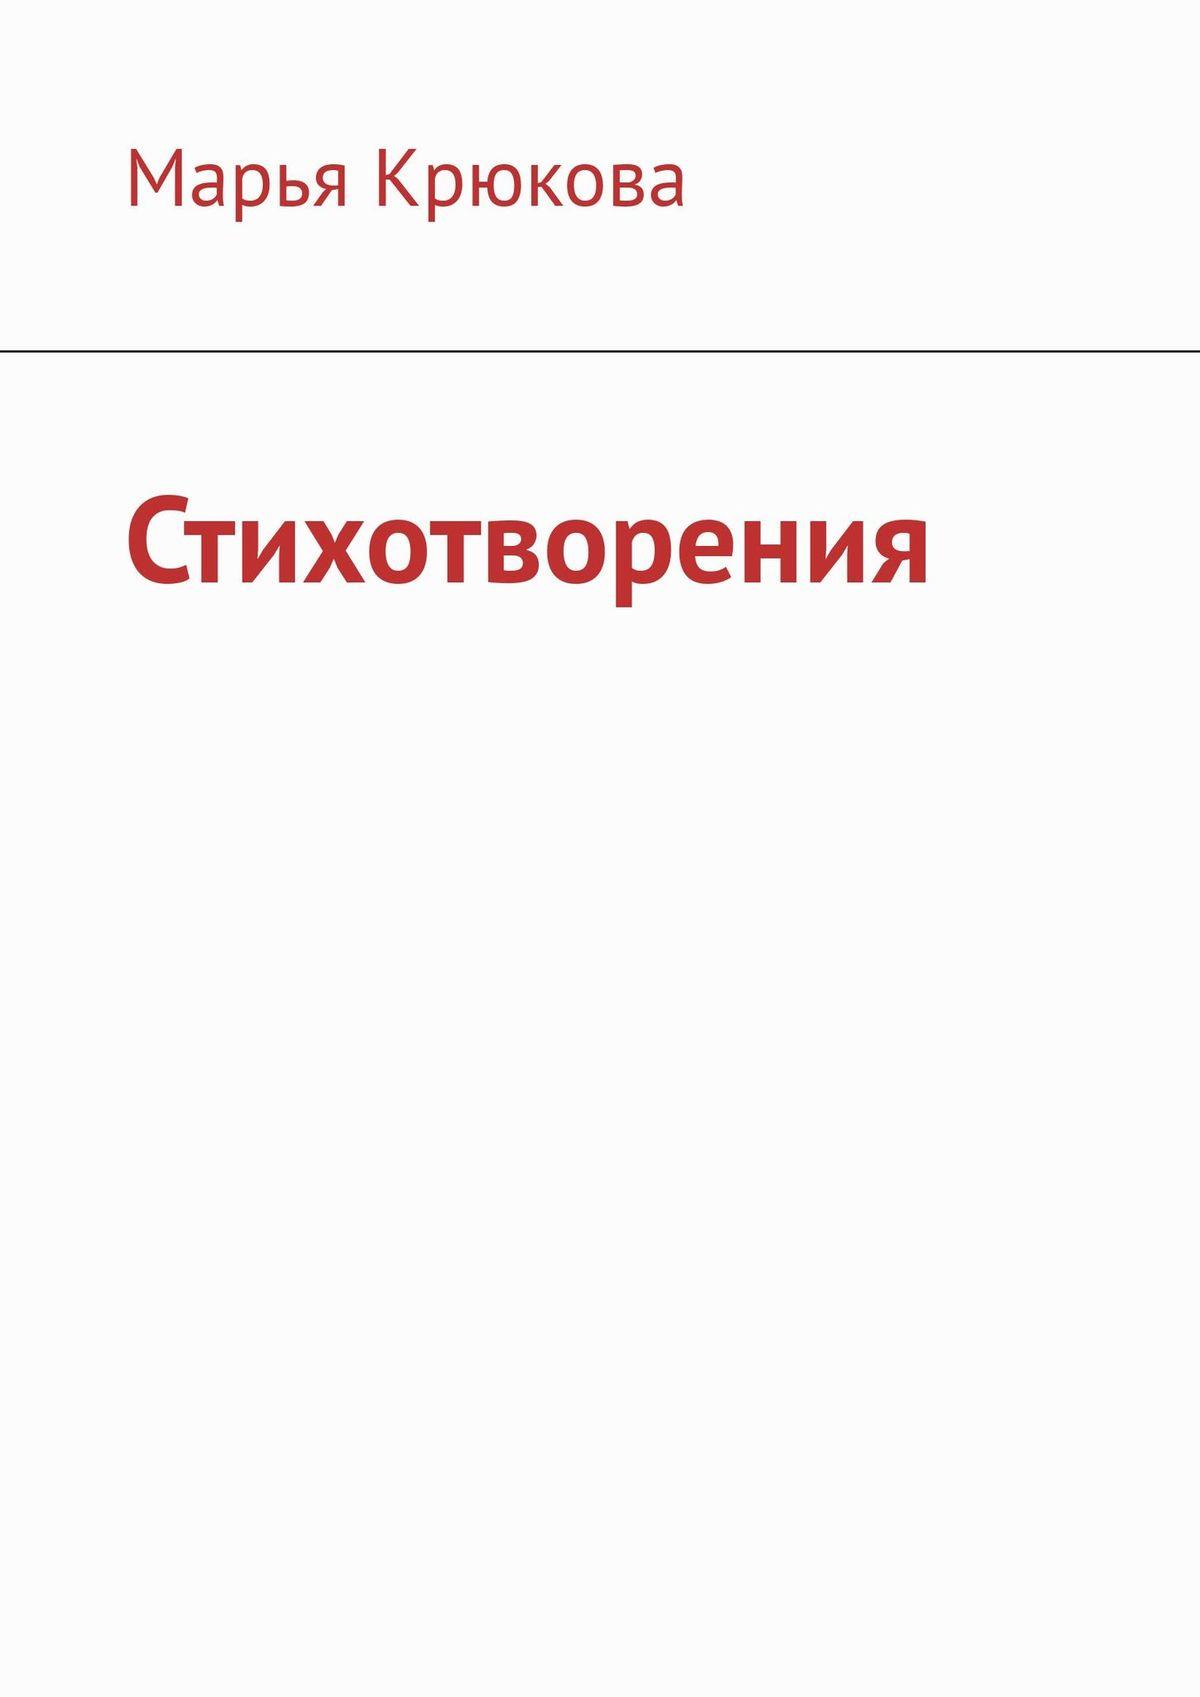 Марья Крюкова Стихотворения равновесие стихотворения